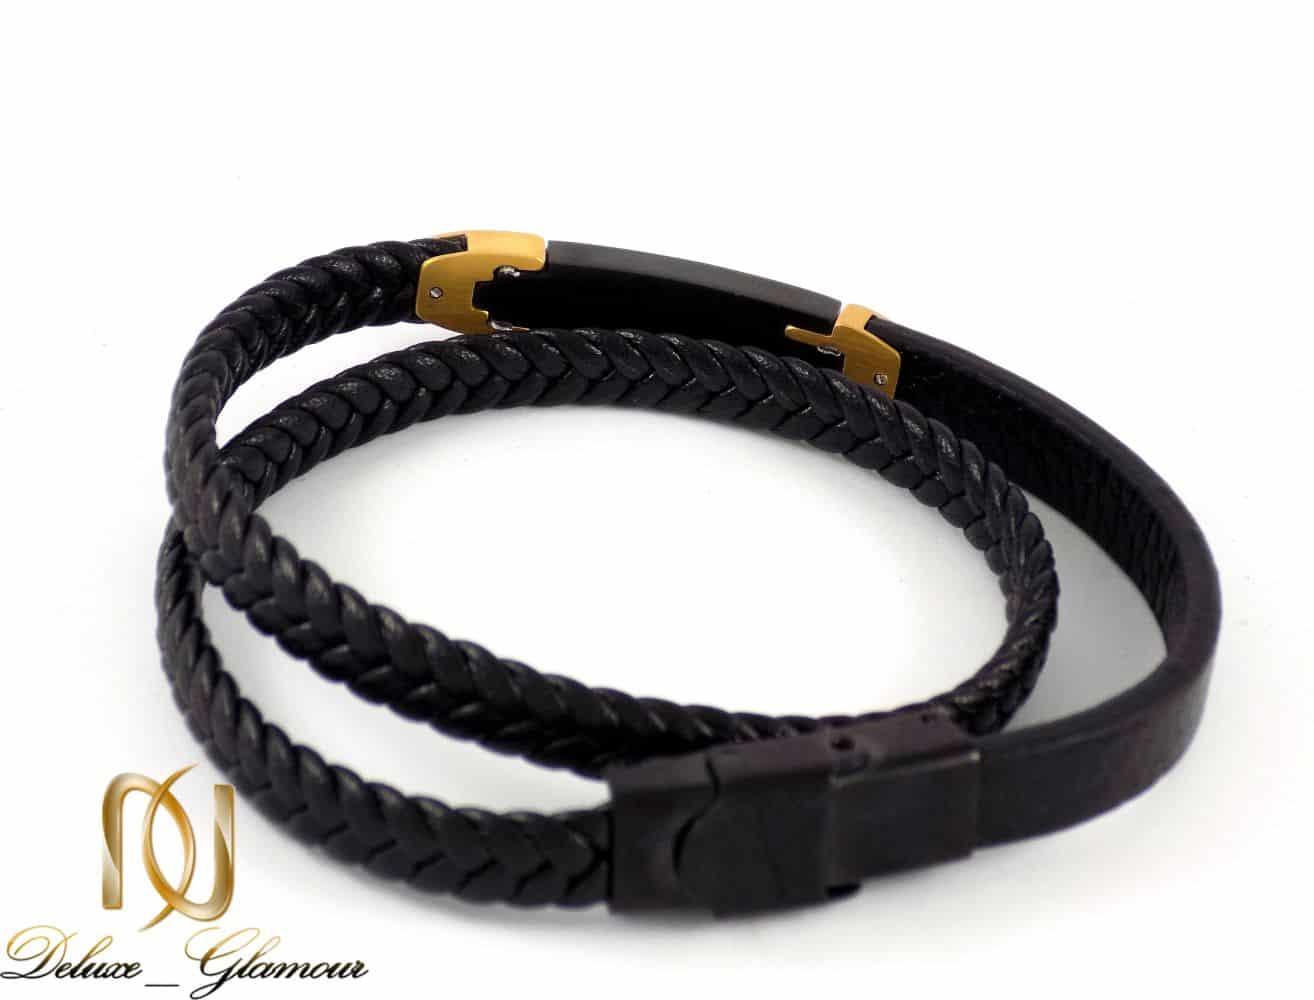 دستبند چرم مردانه طرح مونت بلانک با رویه استیل ds-n198